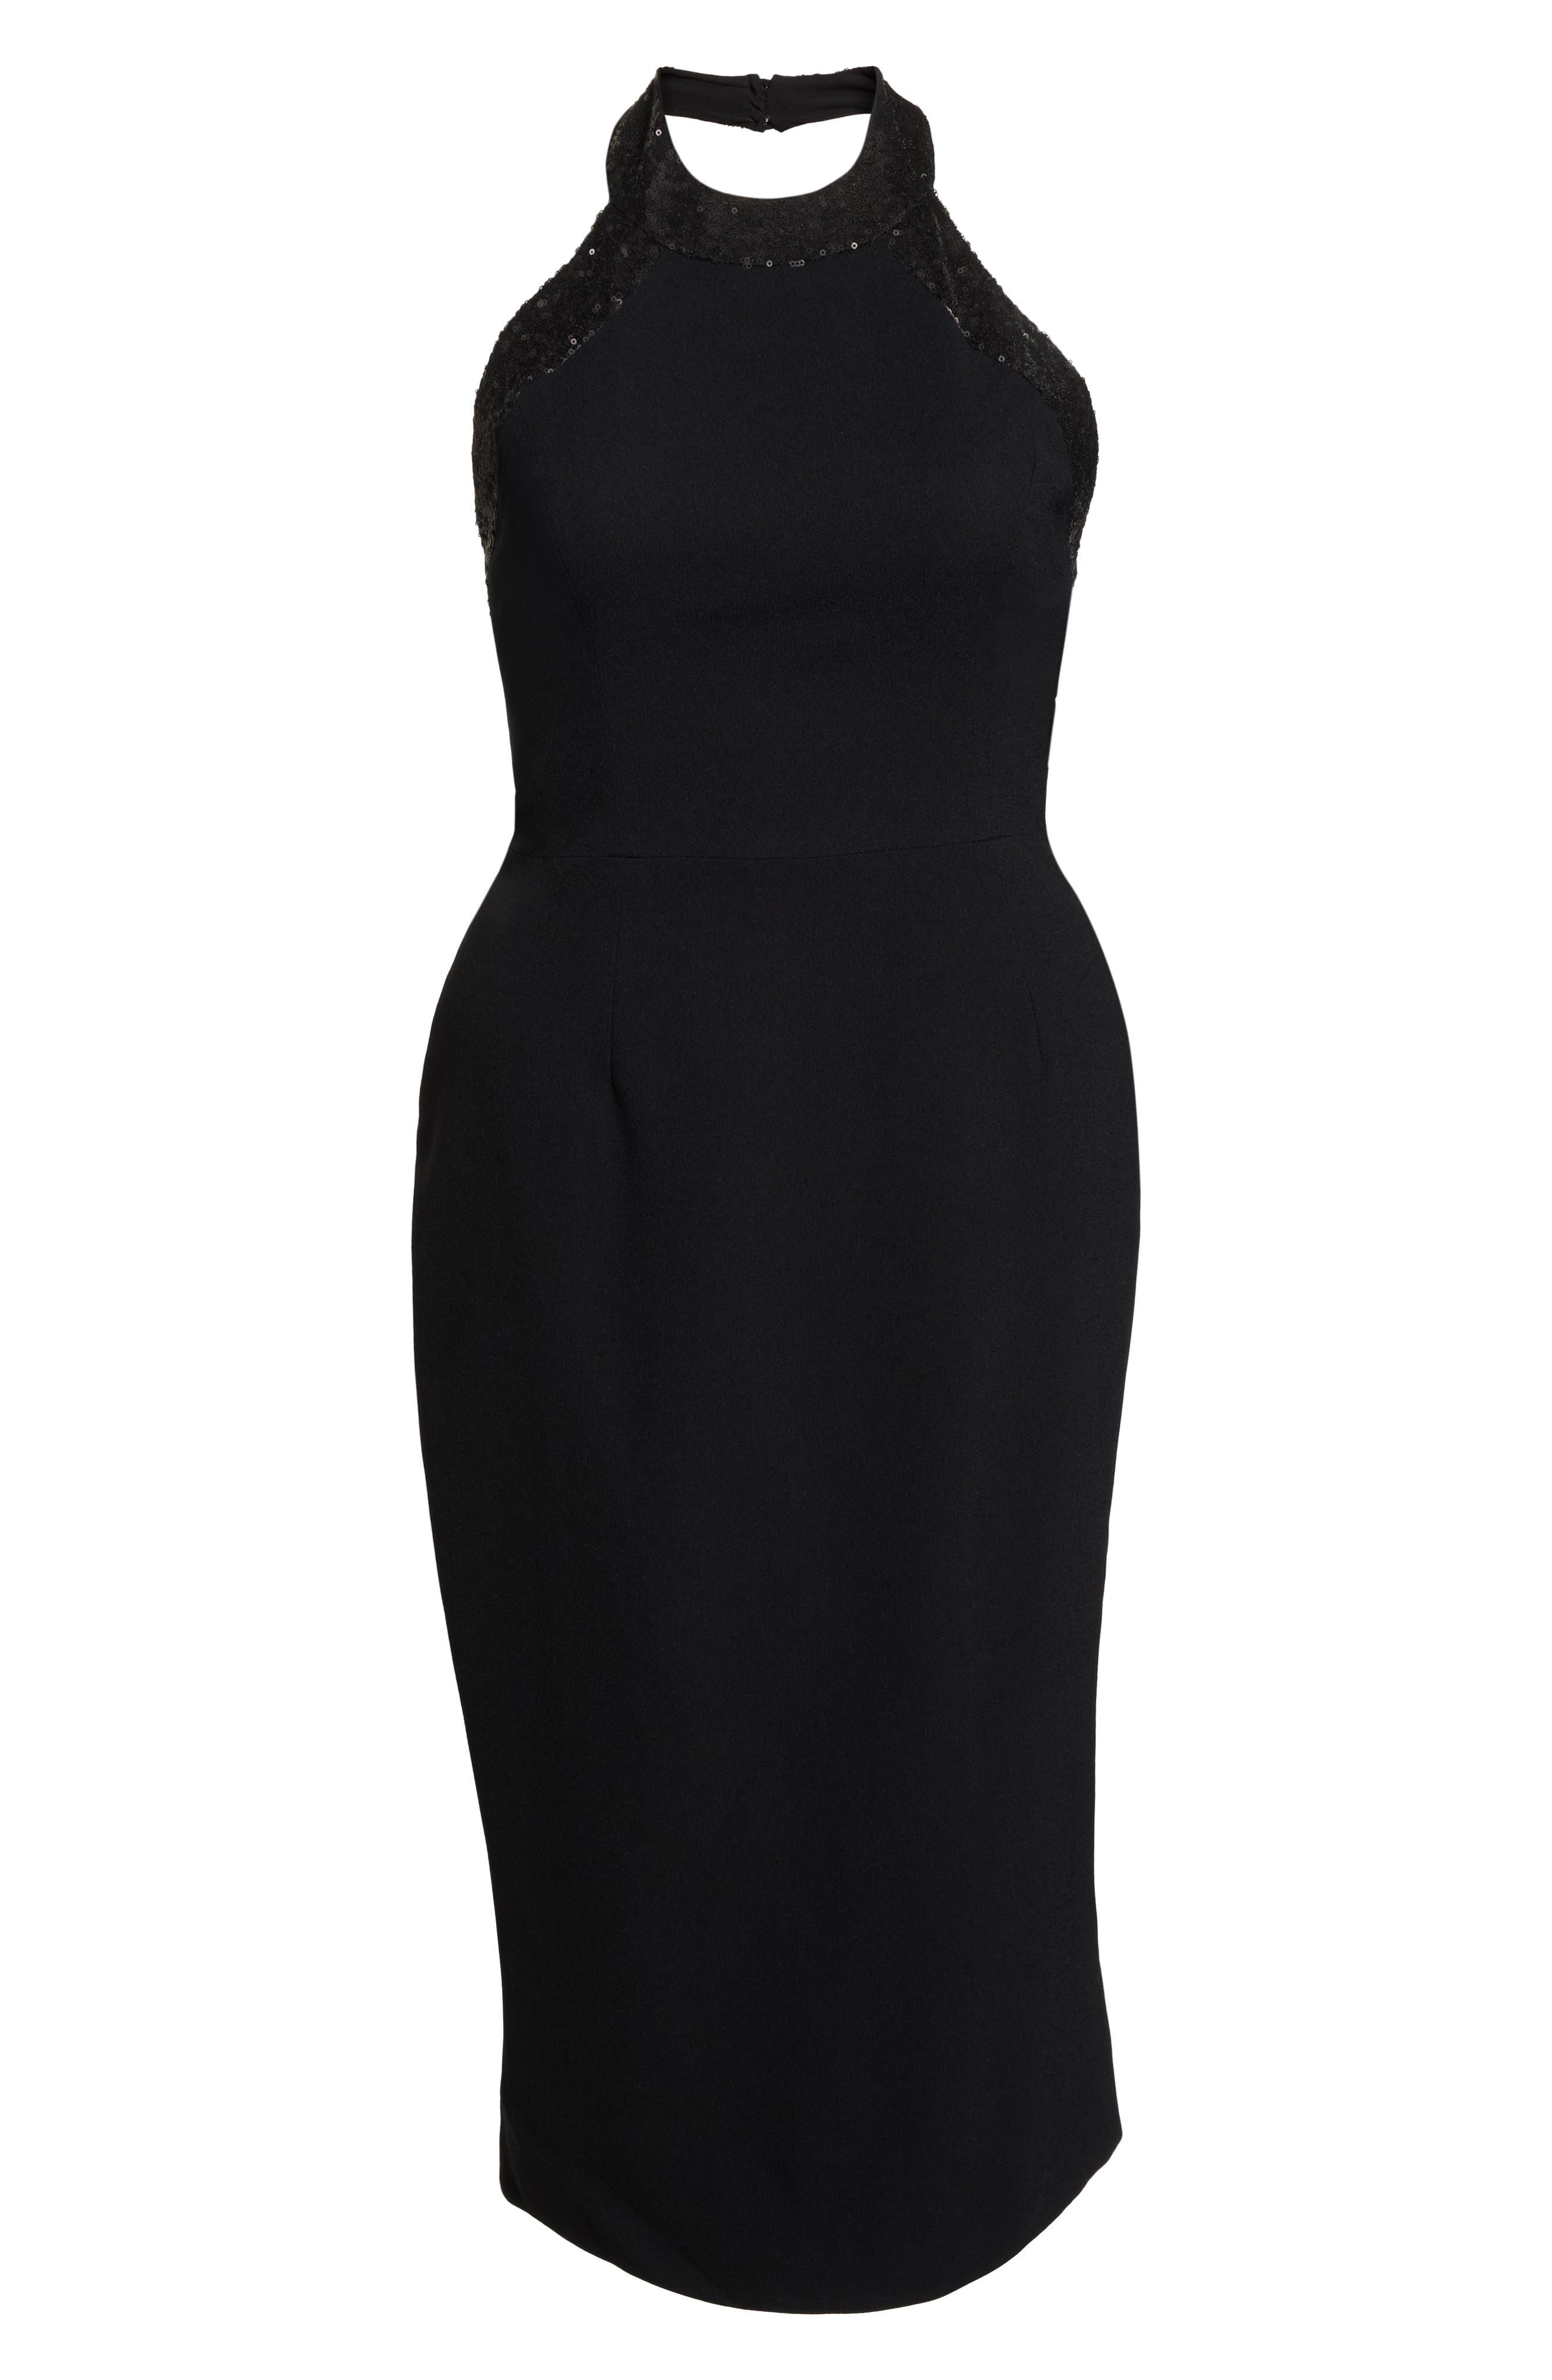 Cleo Halter Dress,                             Alternate thumbnail 11, color,                             BLACK/ BLACK